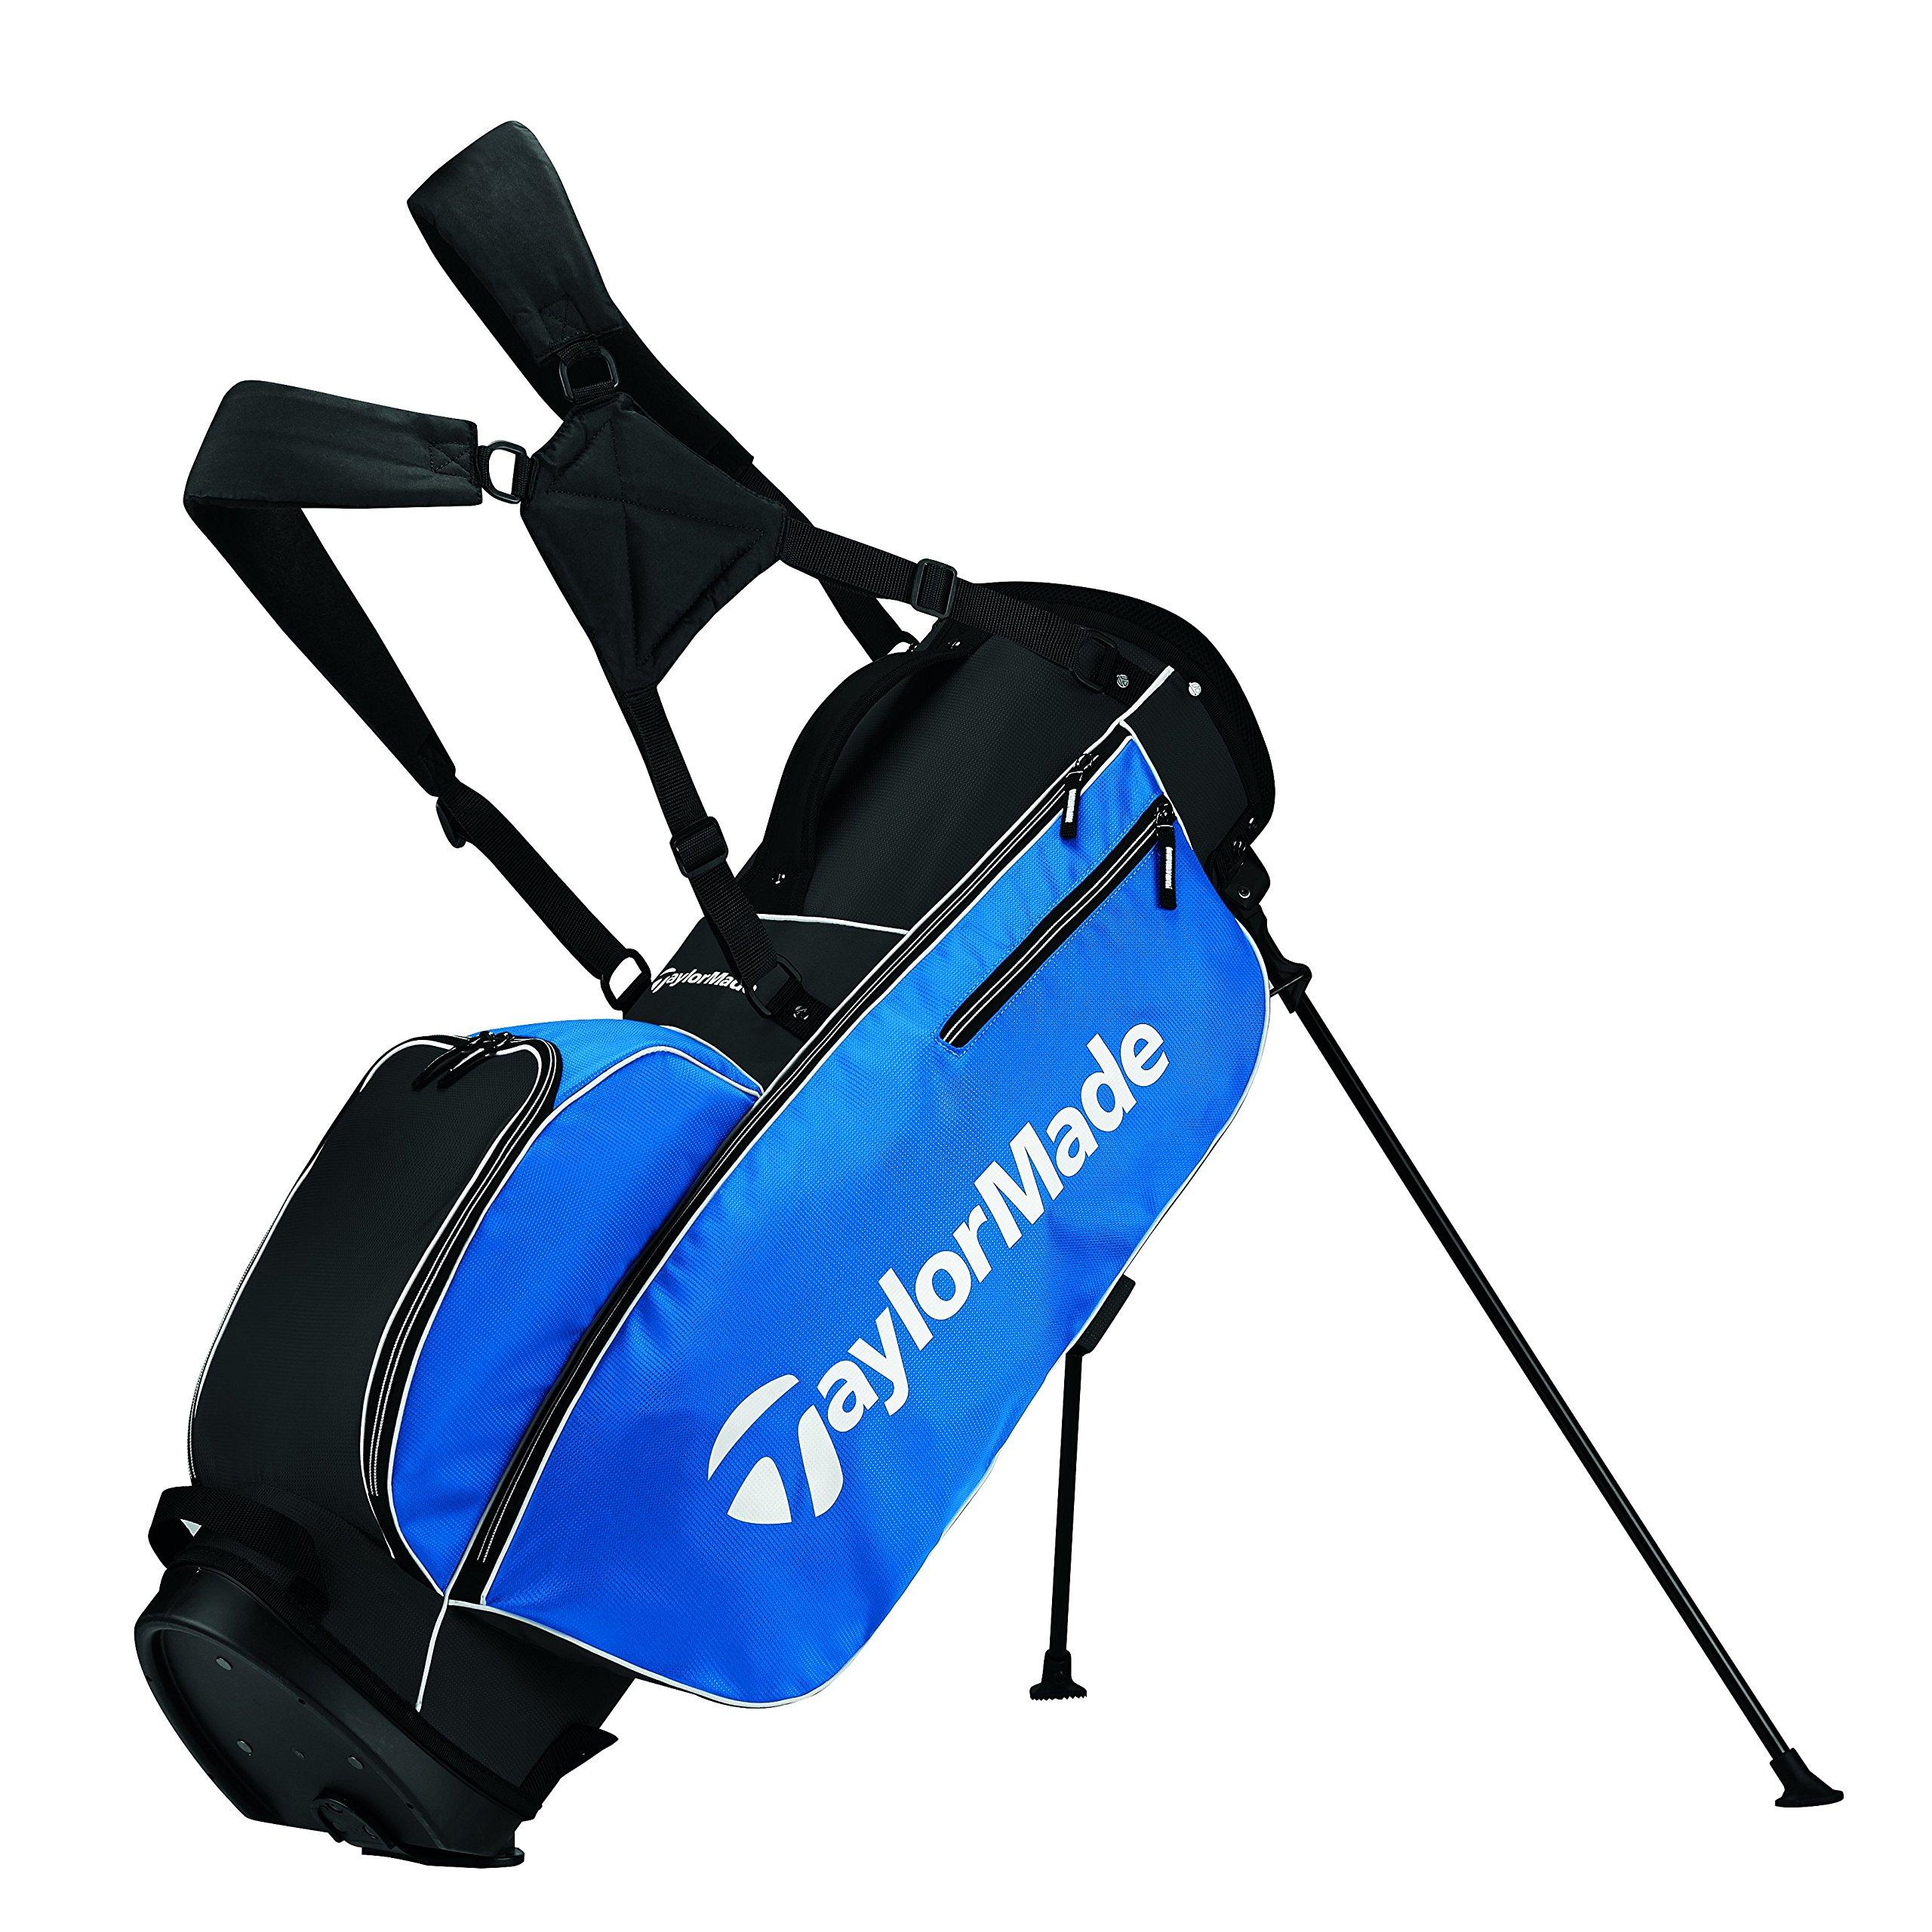 TaylorMade 2017 TM 5.0 Stand Golf Bag, Blue/Black/White